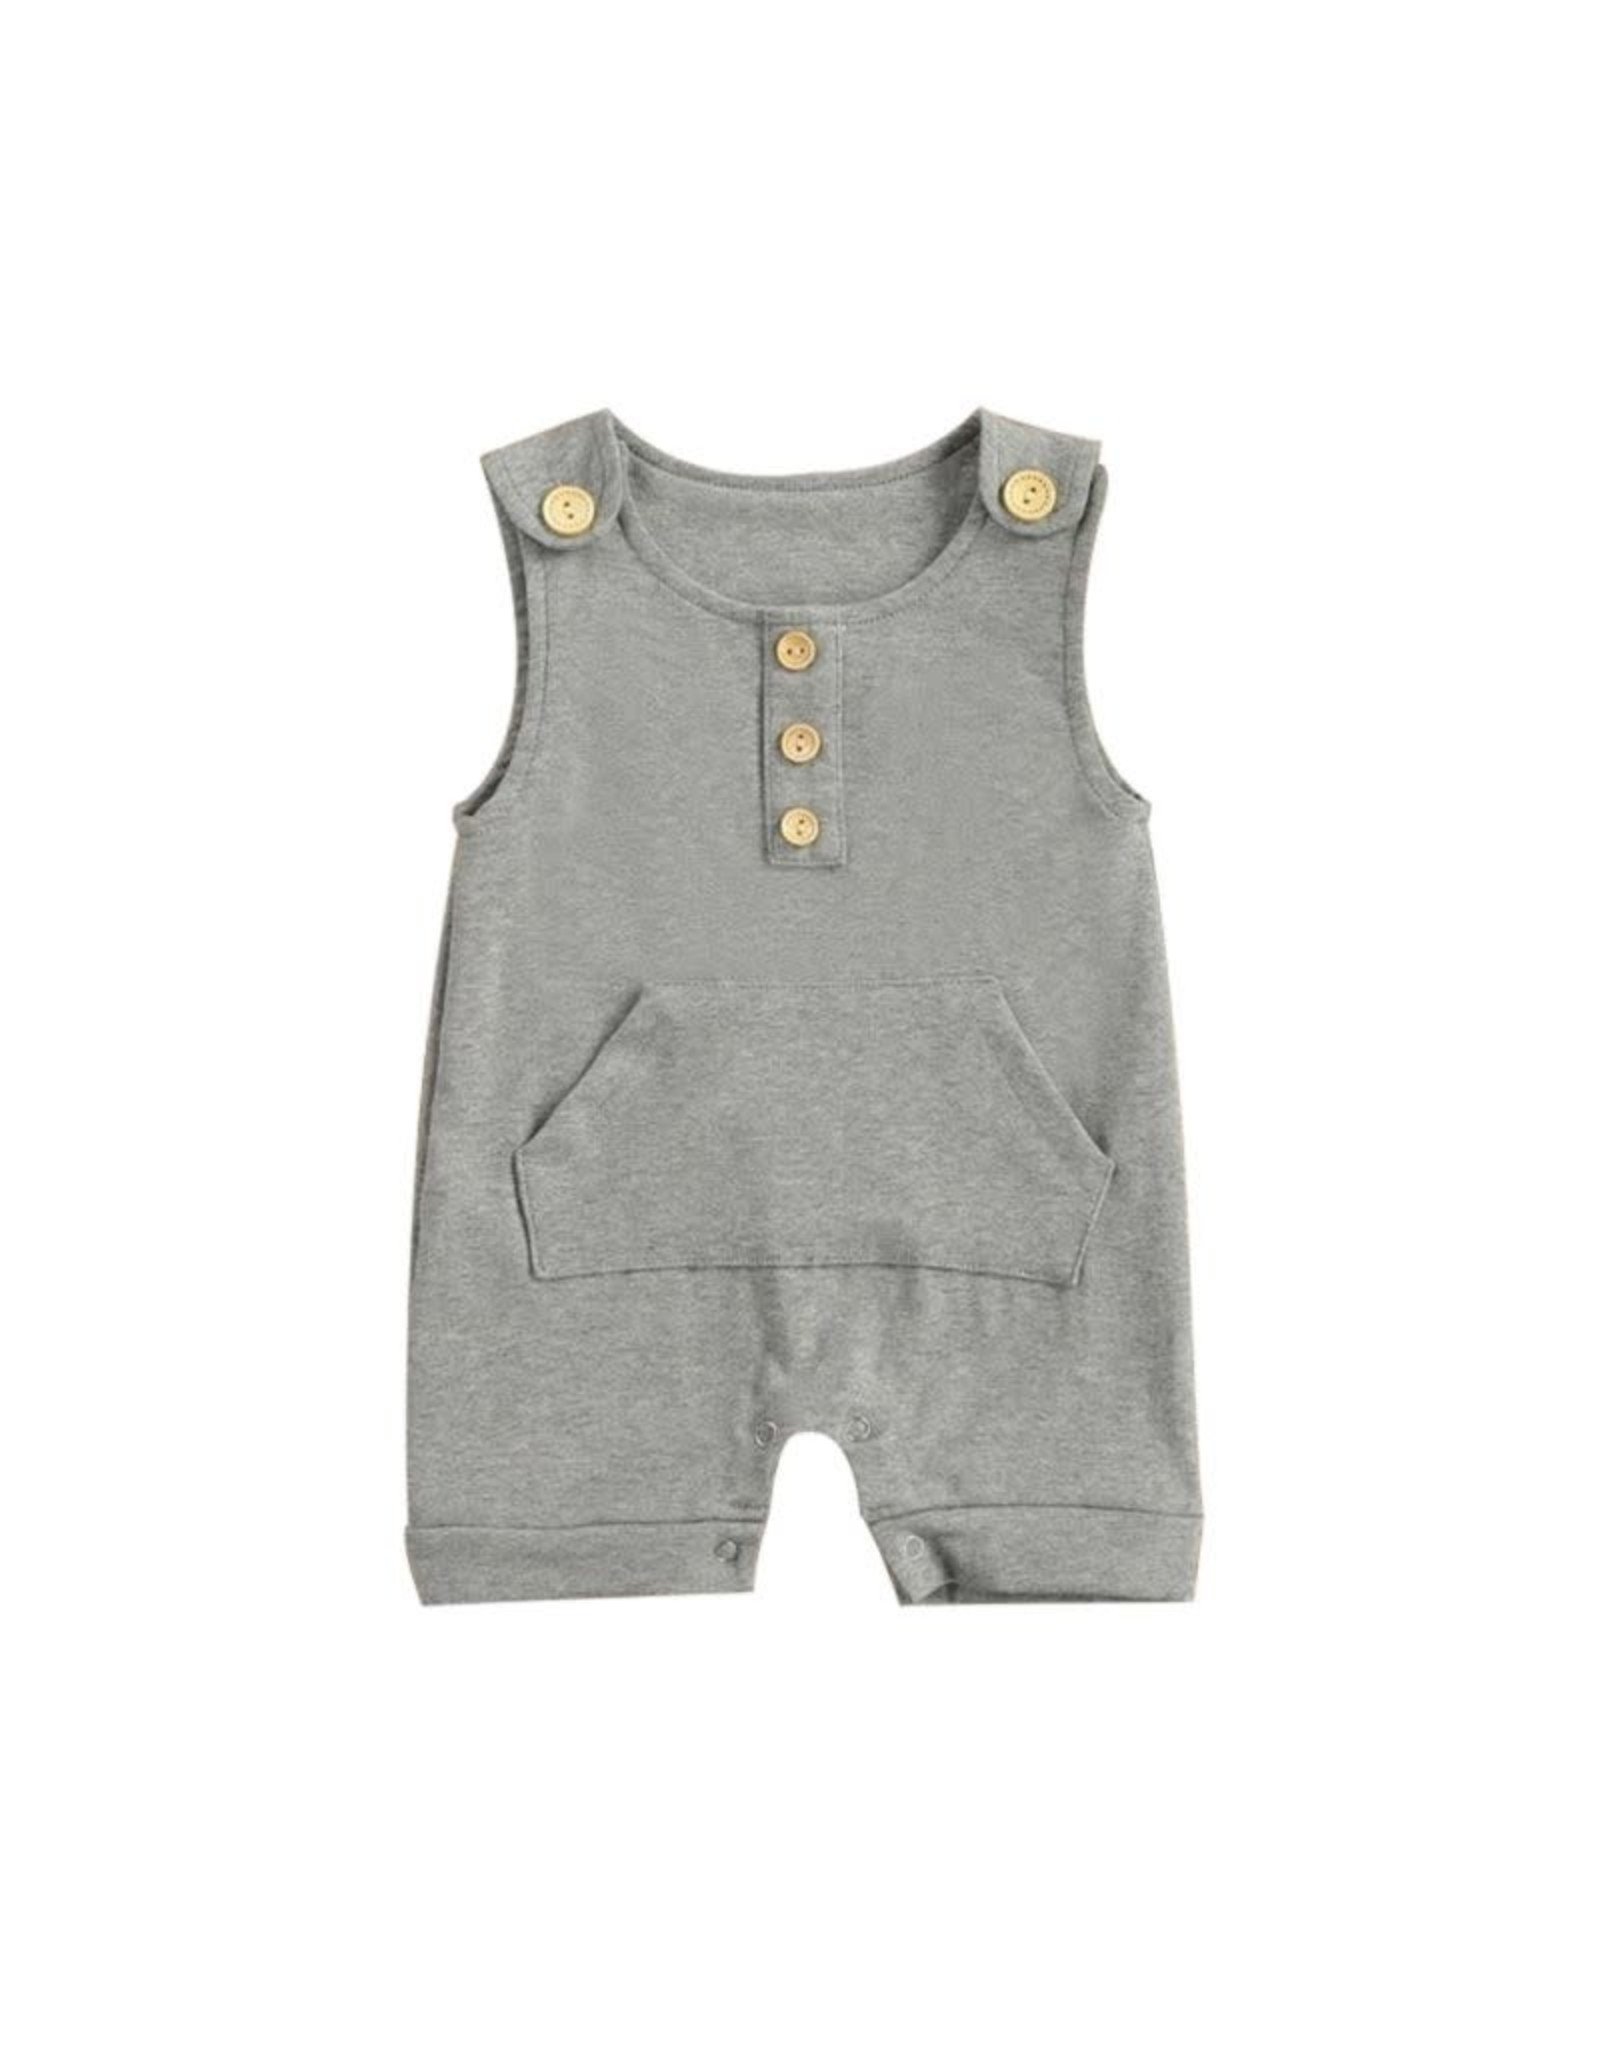 loved by Jade Presley loved by jade presley - Jase Pocket Button Romper: Grey